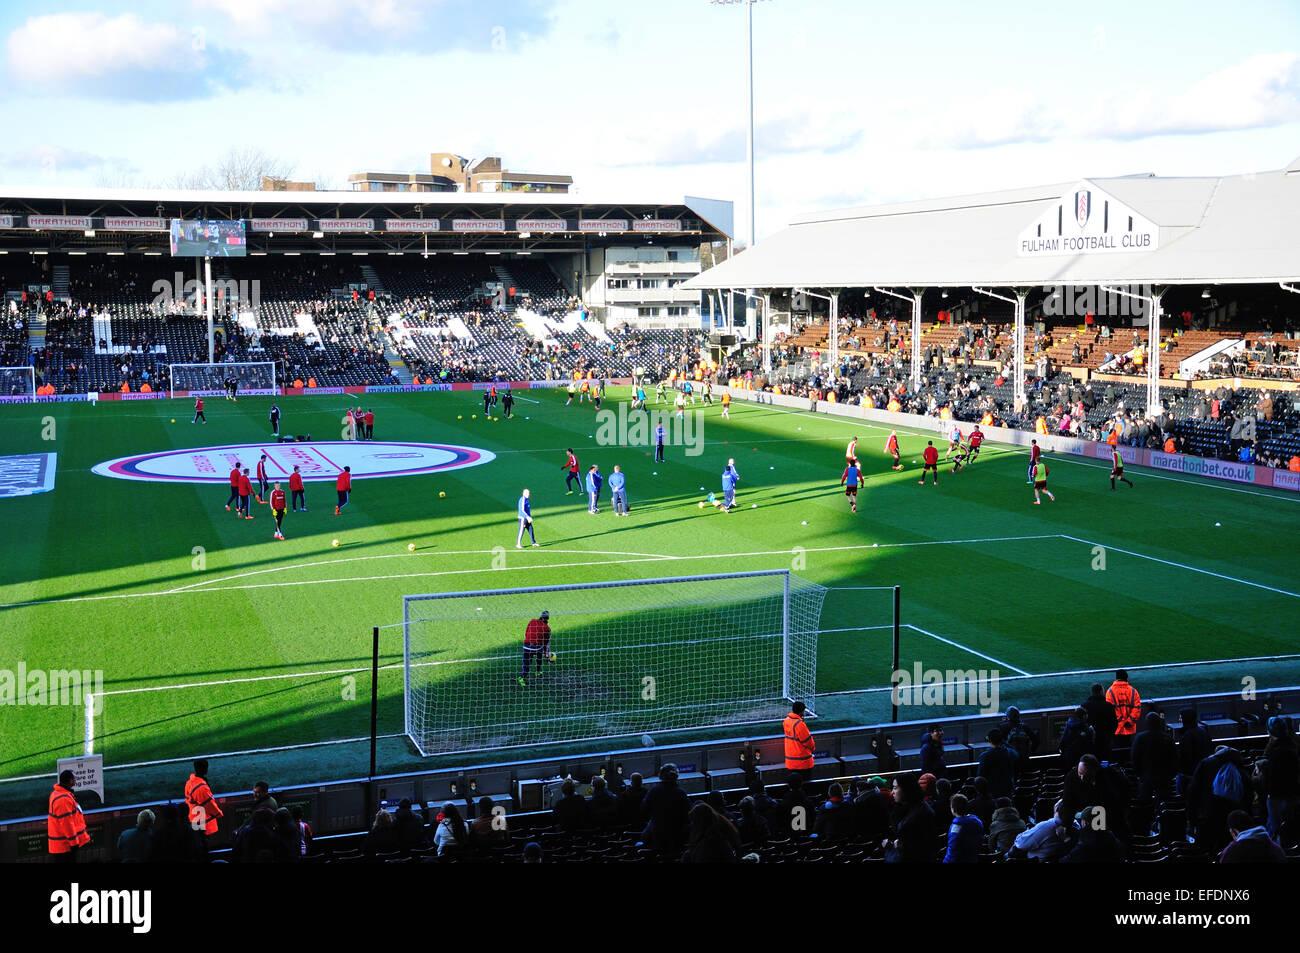 Fulham vs Sunderland match at Craven Cottage Football Ground, Stevenage Road, Fulham, London, England, United Kingdom - Stock Image